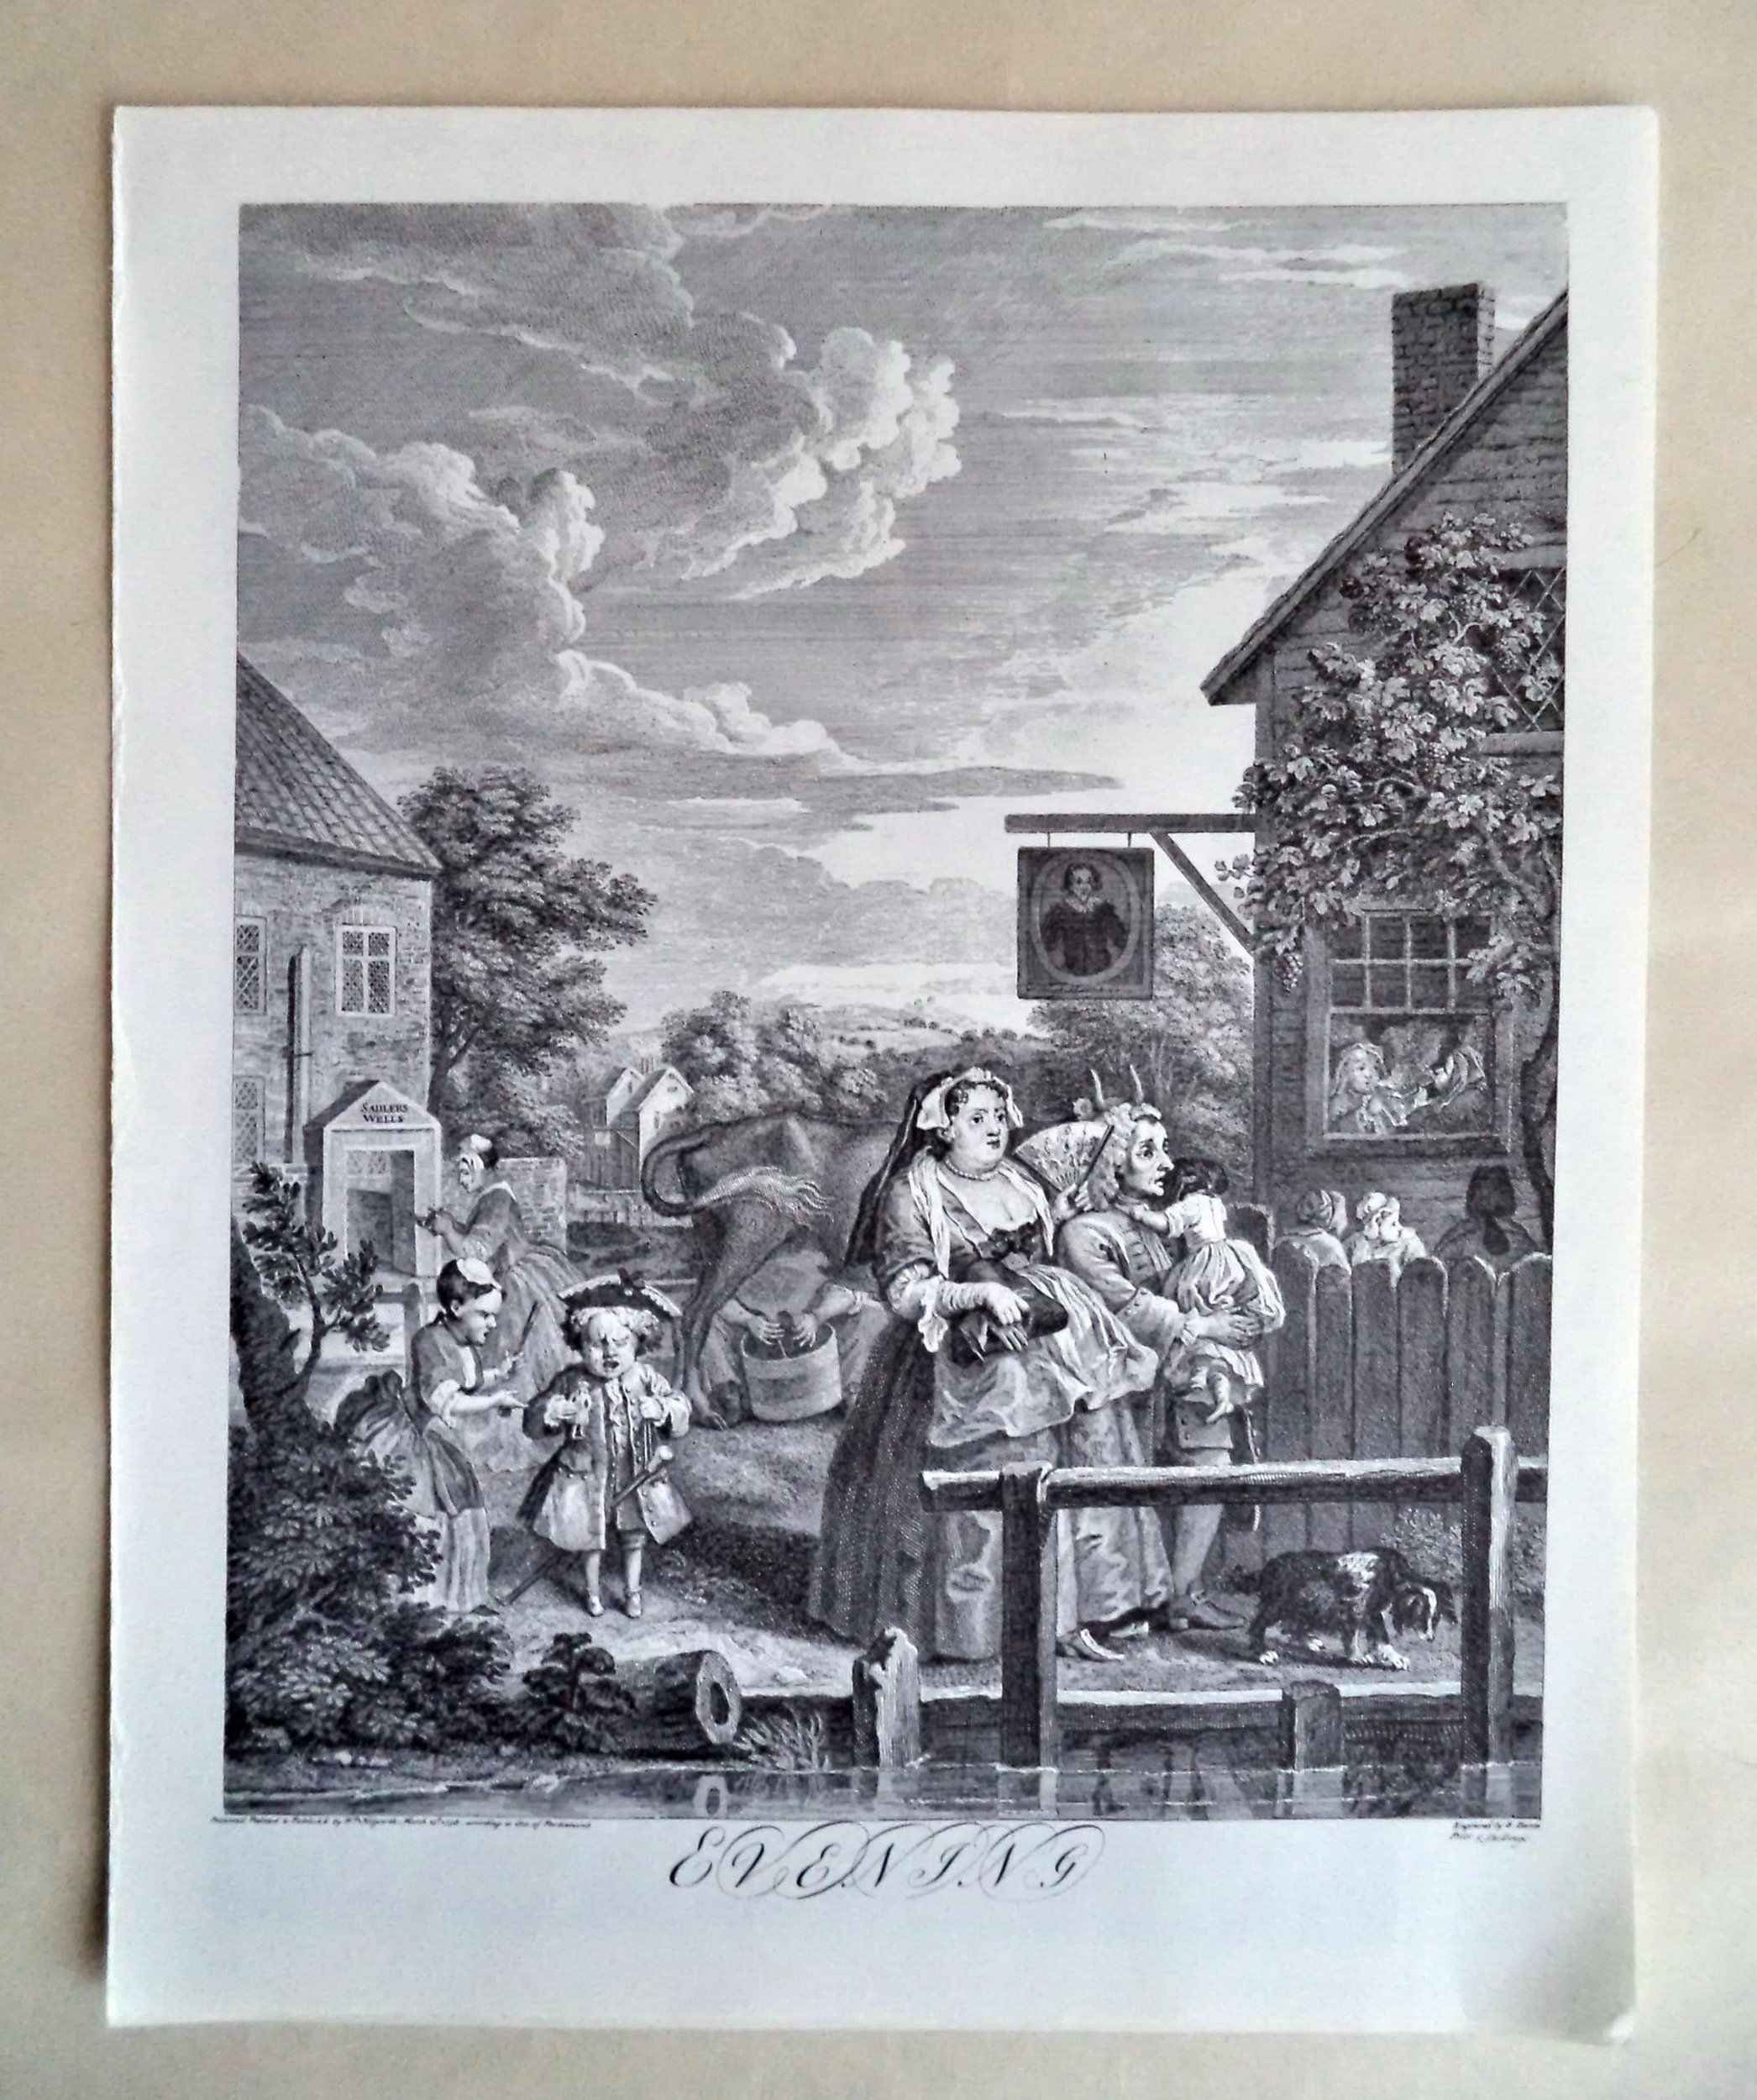 Vintage Hogarth Evening Original Engraving Print Hogarth Print